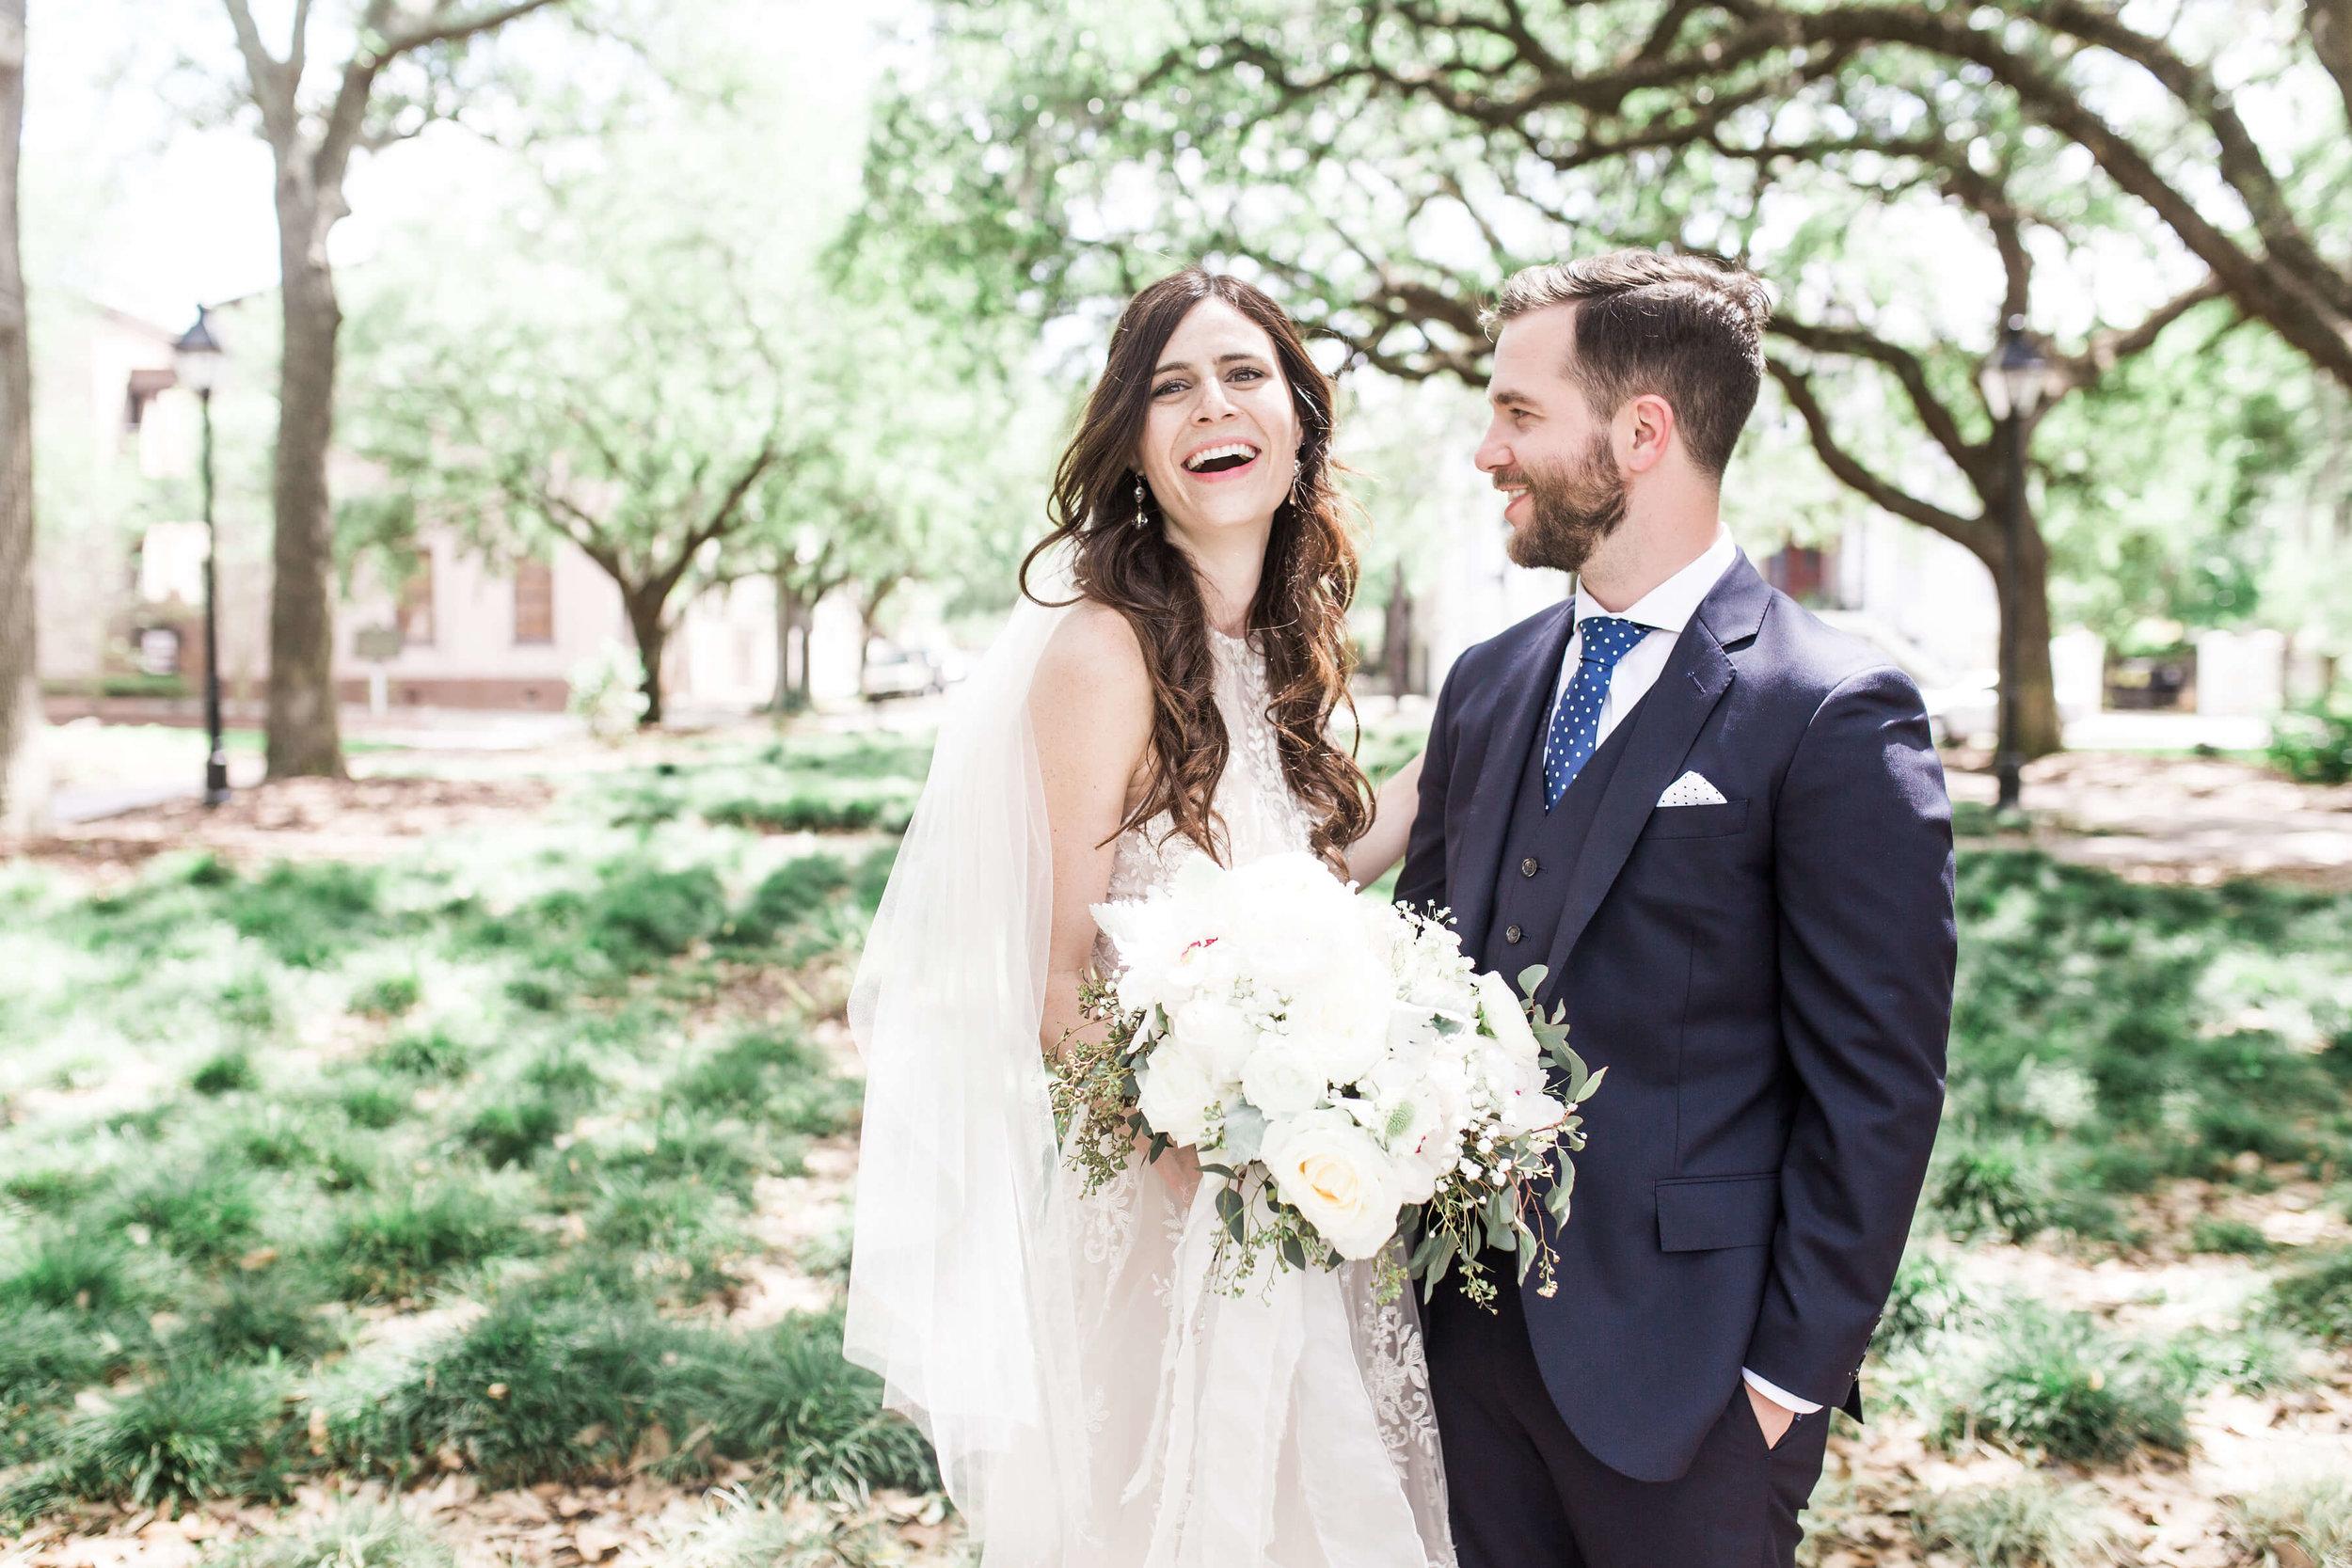 Apt B Photography - Savannah wedding photographer, hilton head wedding photographer, Charleston wedding photographer